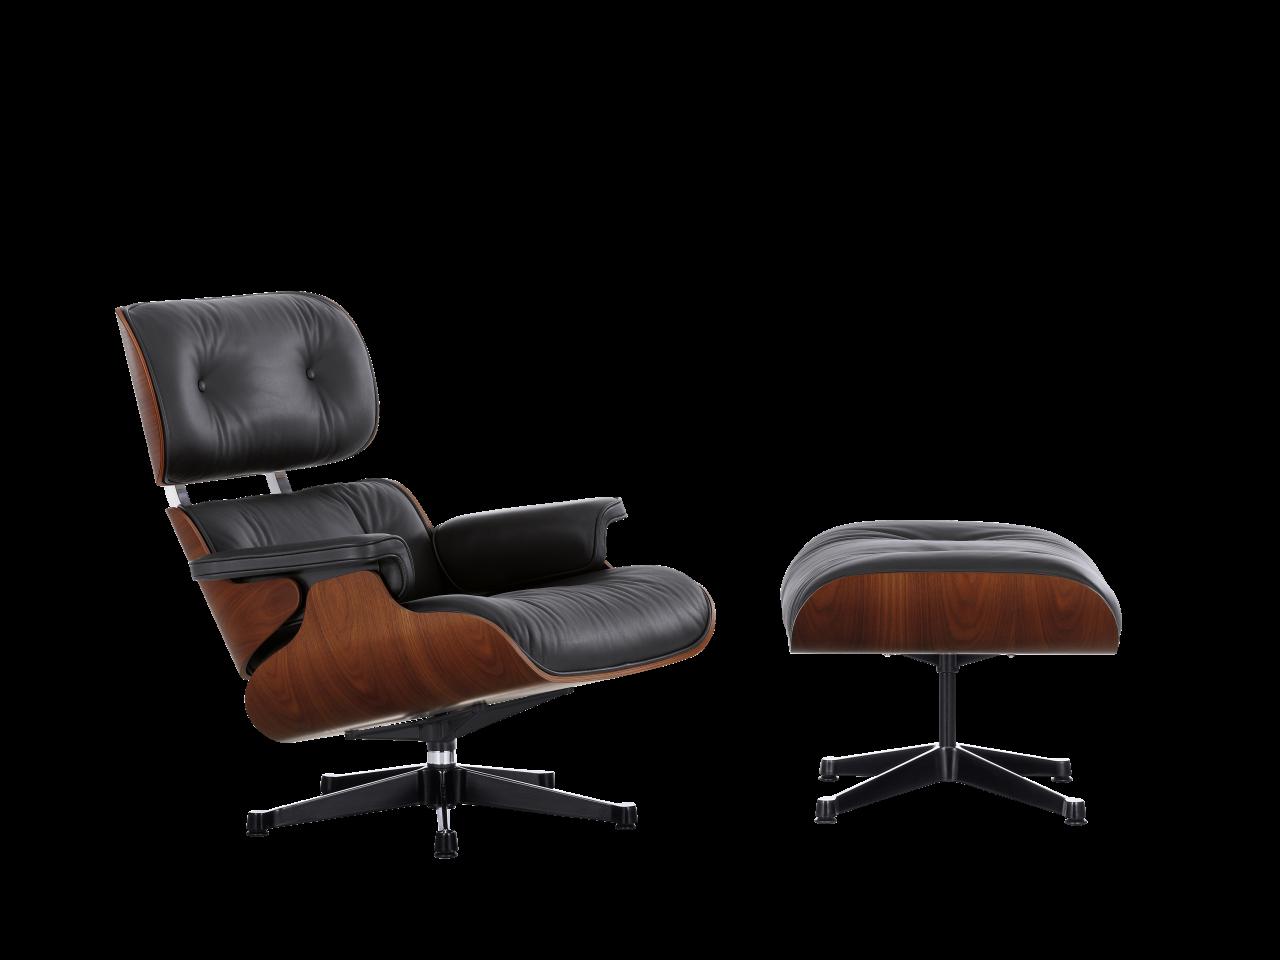 Lounge Chair und Ottoman Limited Edition Mahagony